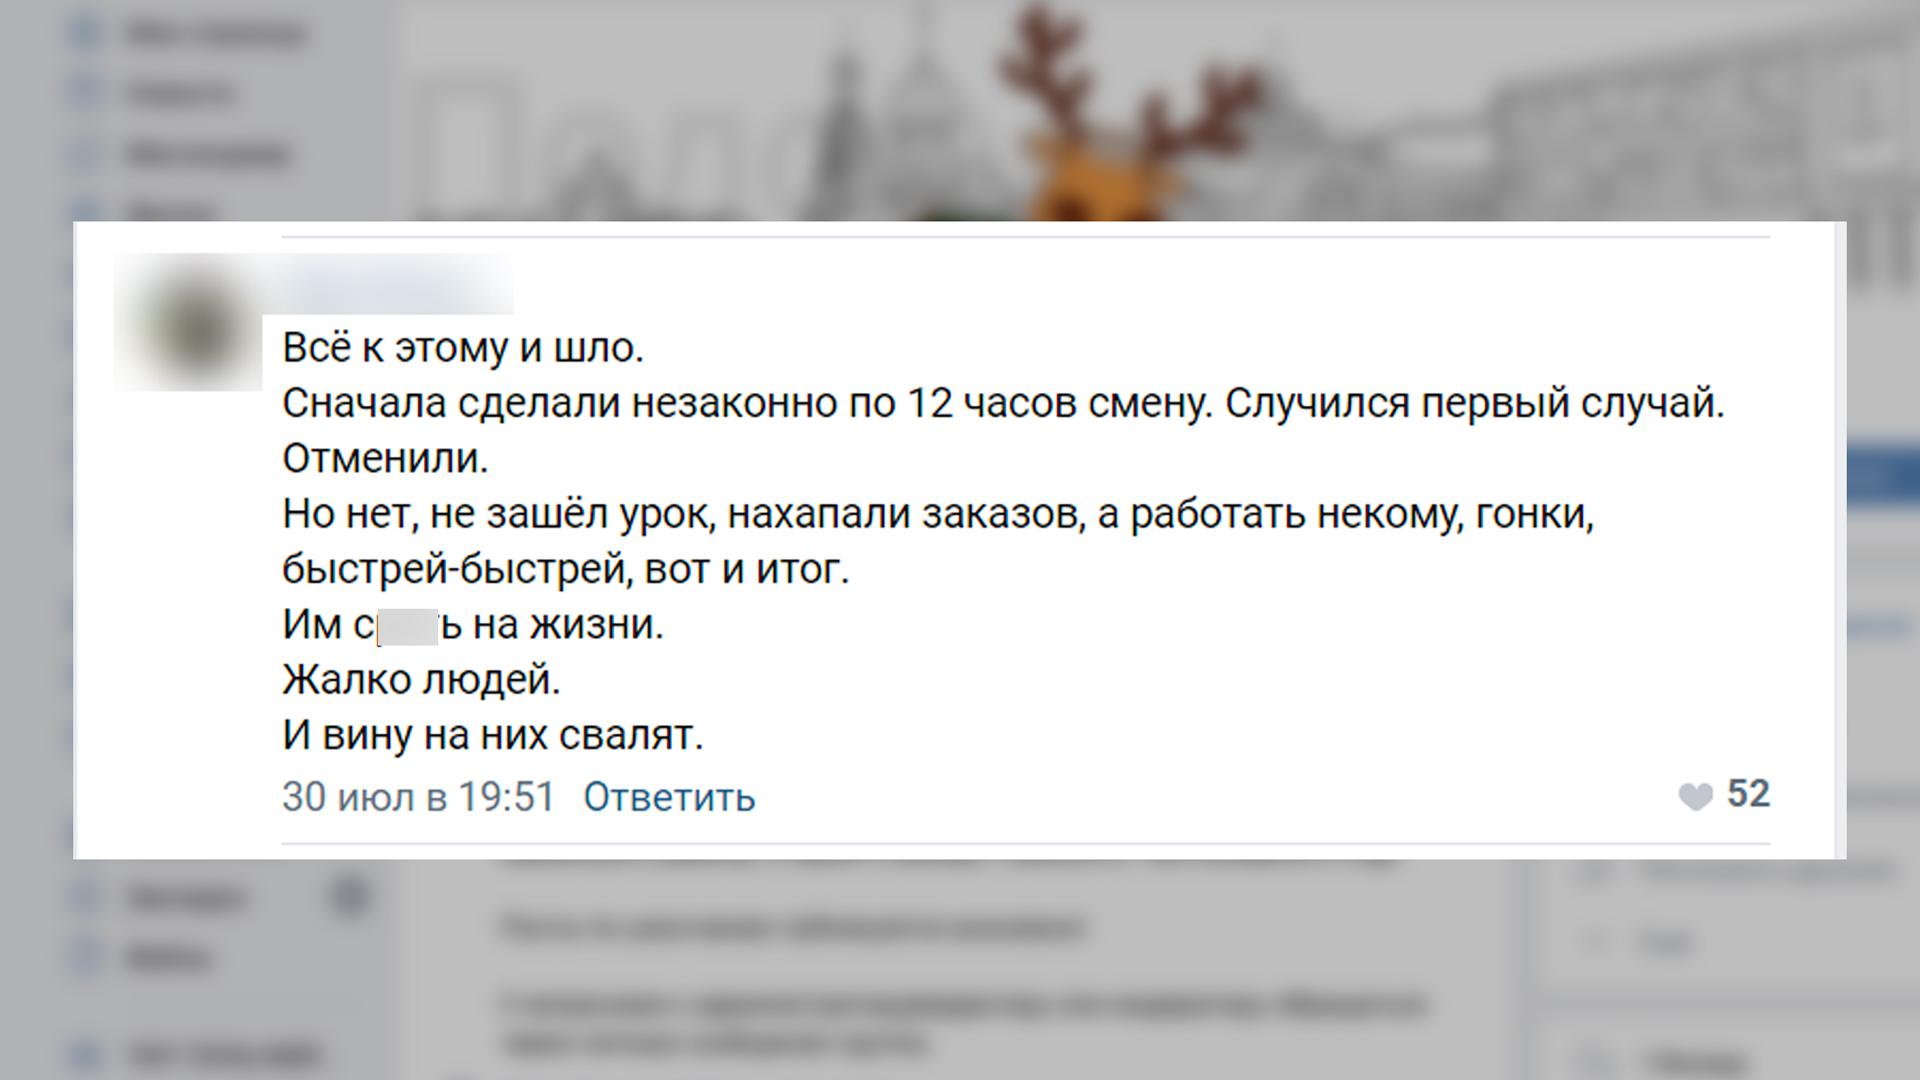 Фото © VK / Подслушано в Каменске-Шахтинском